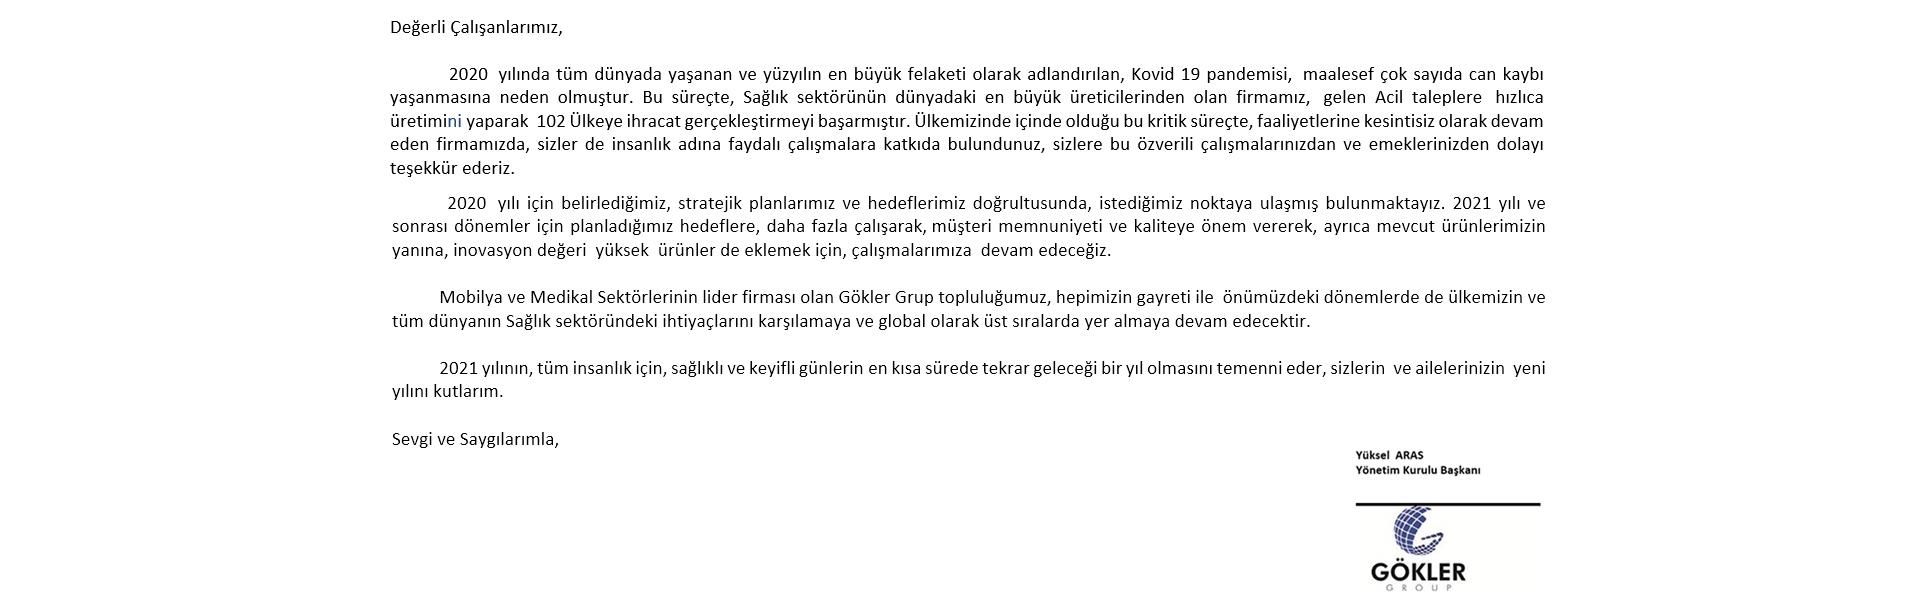 medica 2019 türkçe